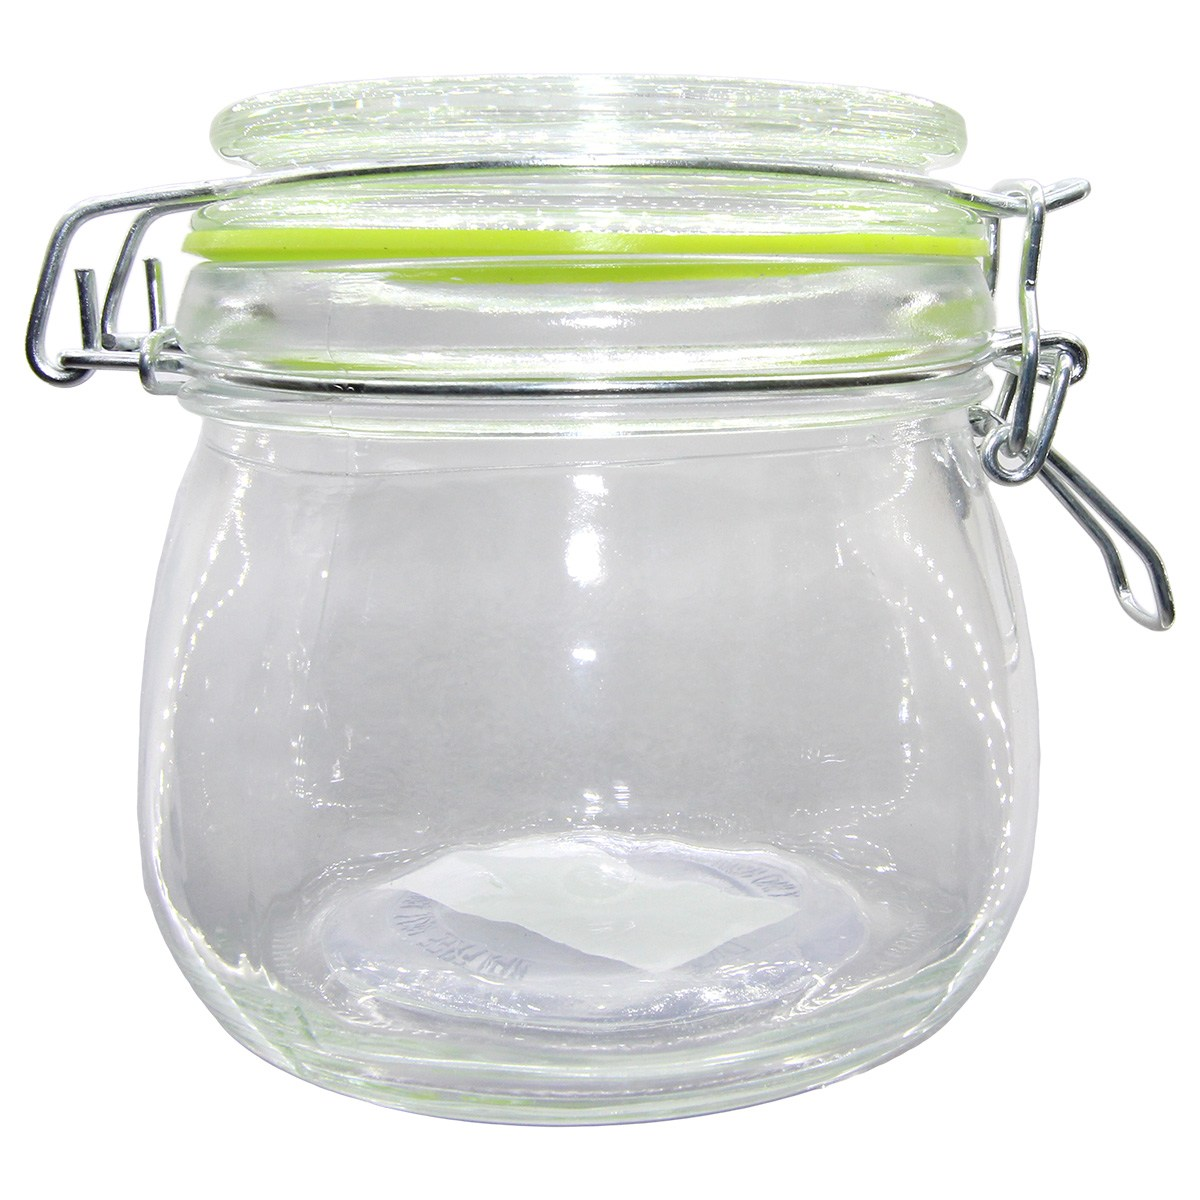 Pote hermético vidro Cancun Color verde 520ml 11x10cm Lyor